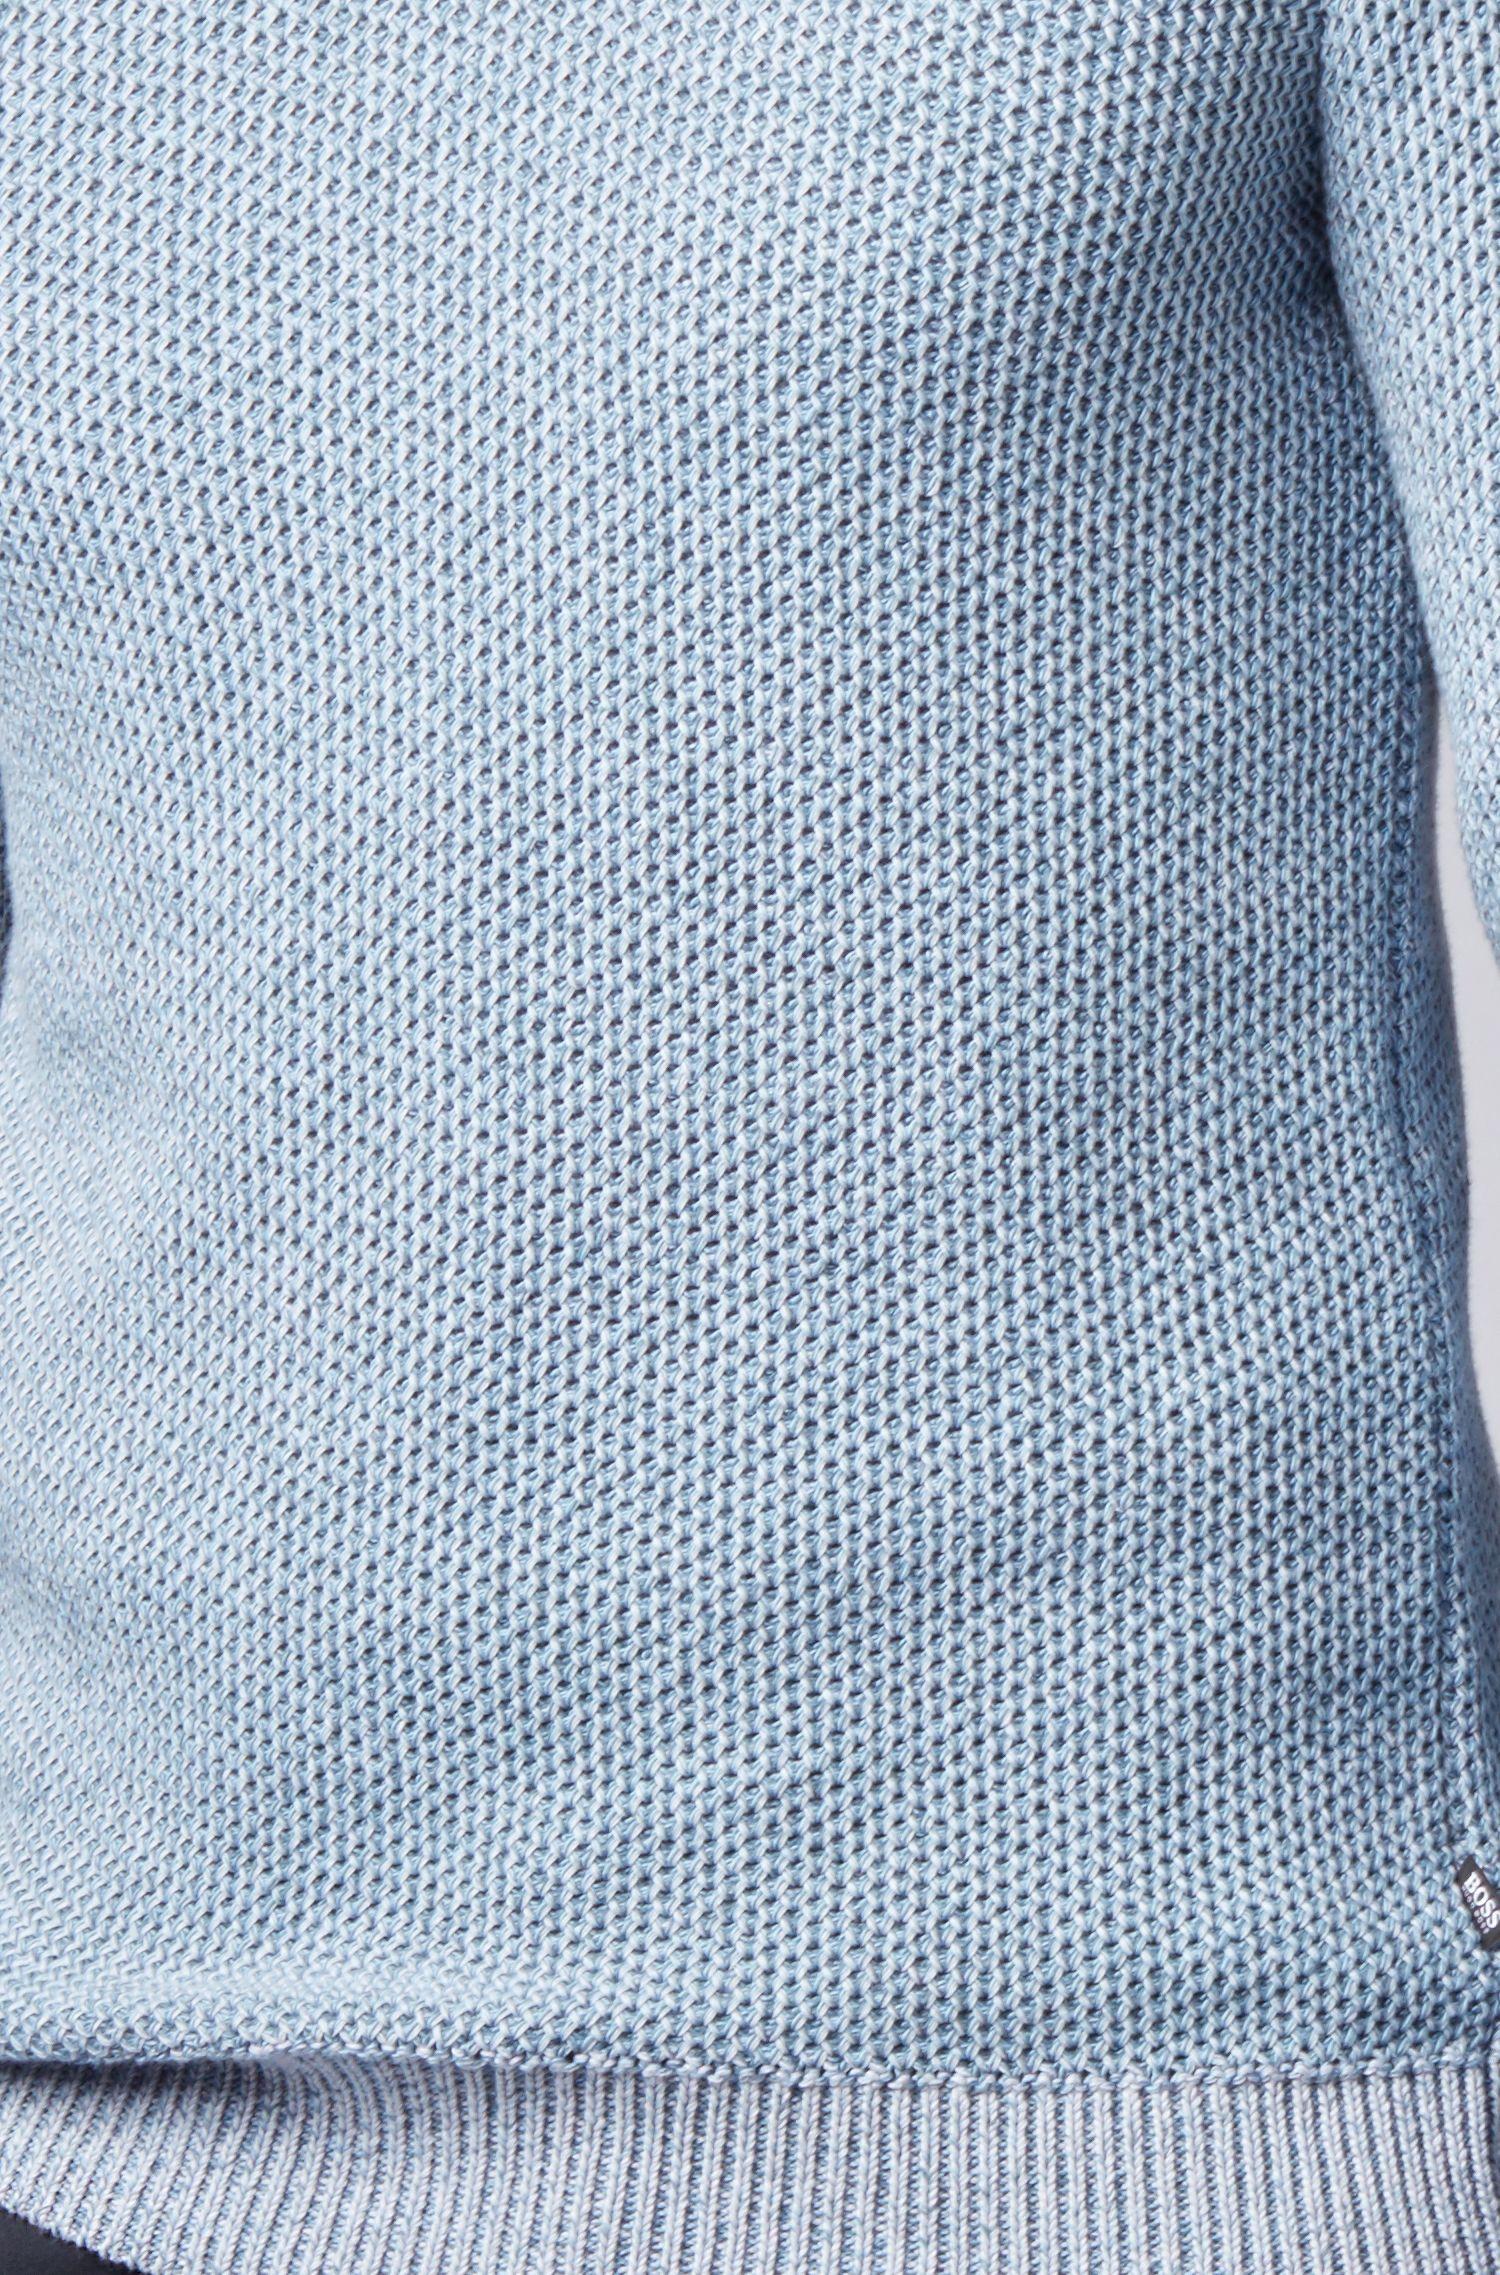 Jersey regular fit en algodón mouliné de punto, Celeste